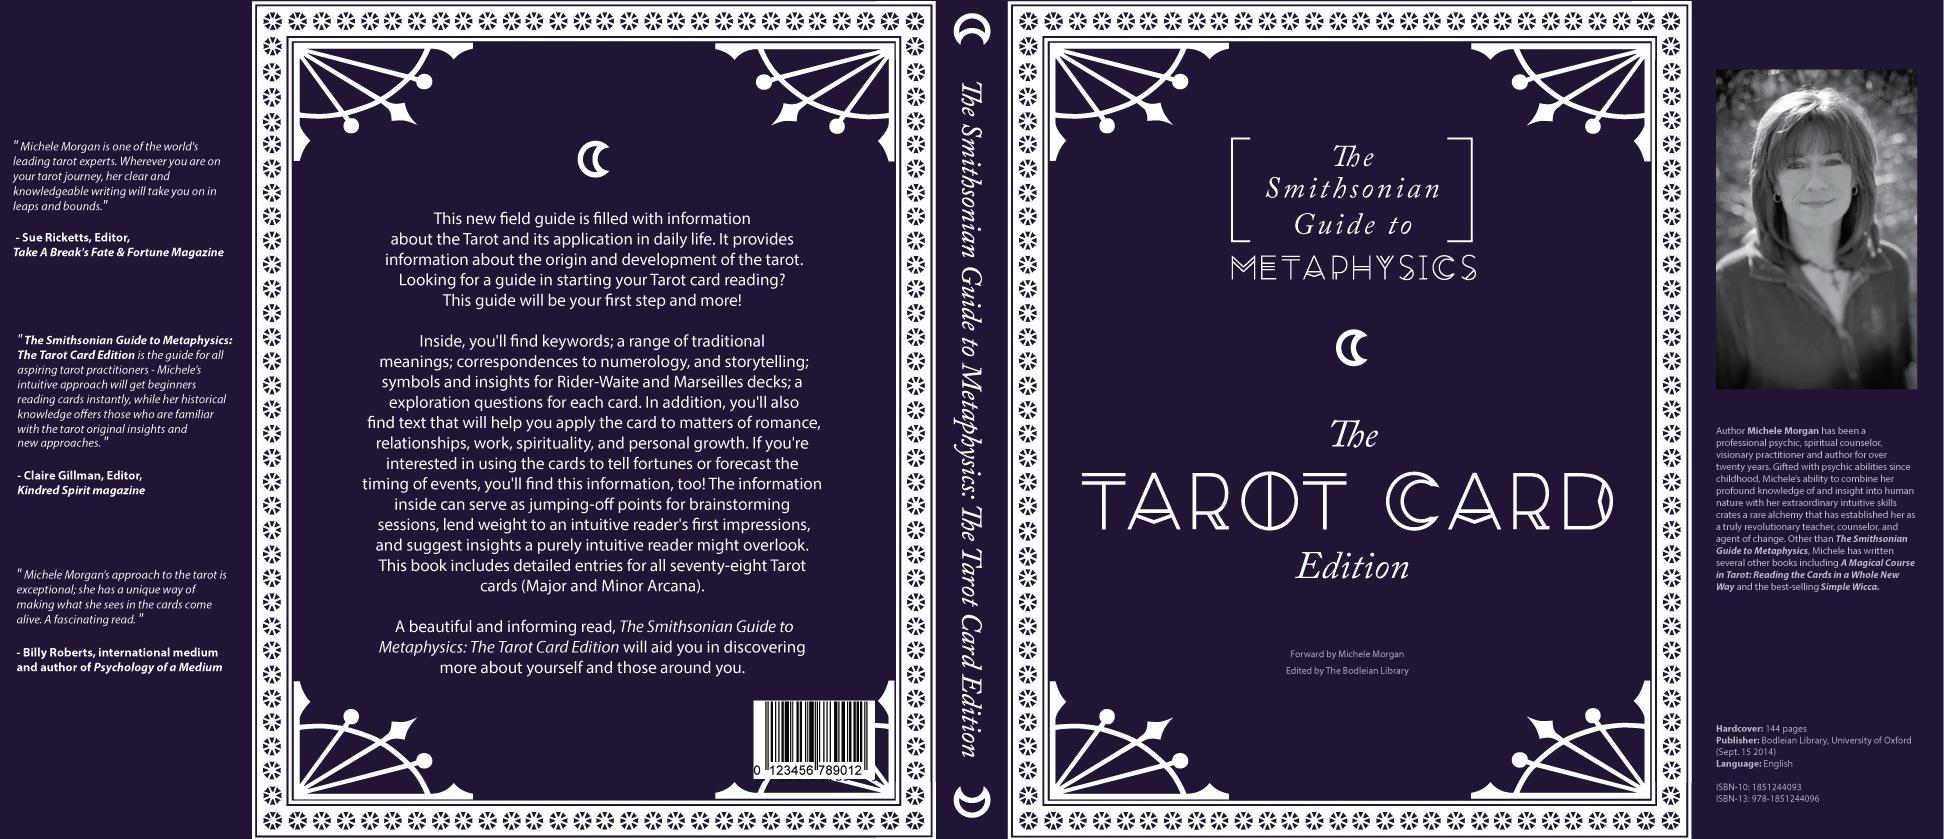 Tarot-Card-Resize.jpg